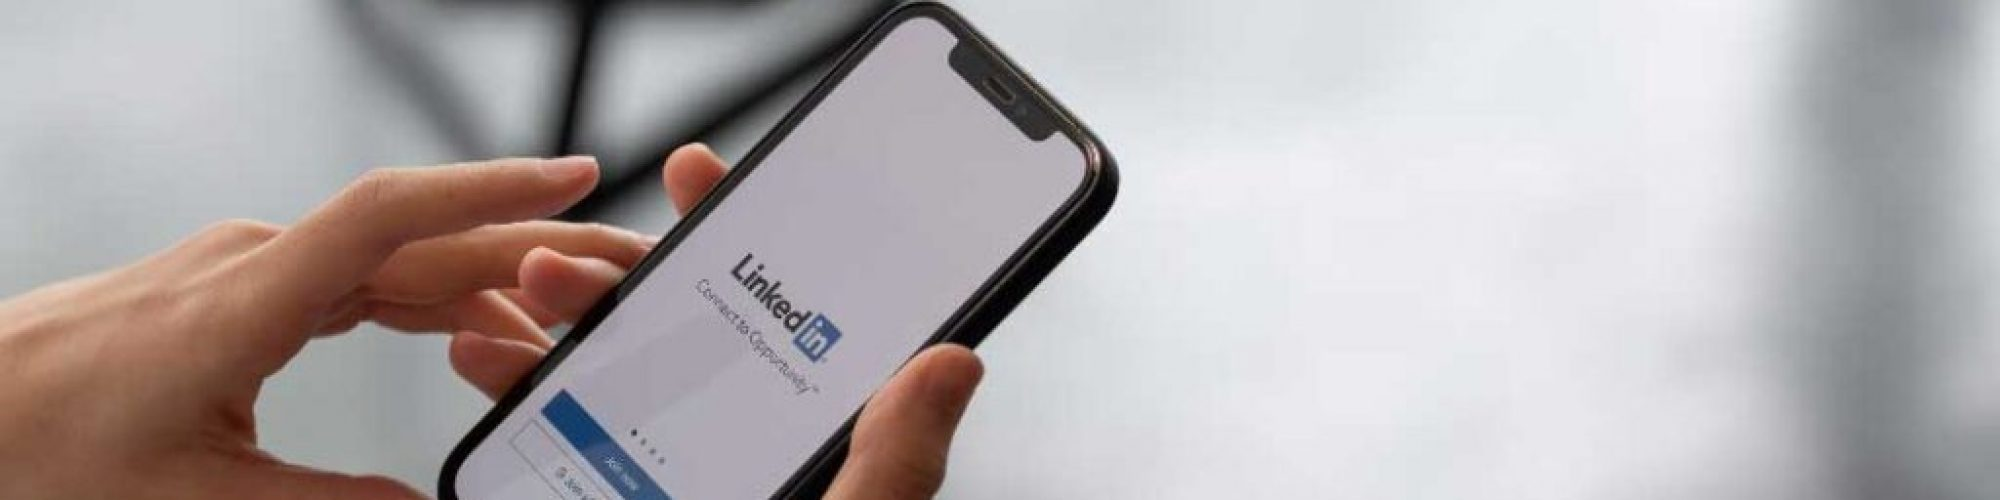 Linkedin-Mobiel